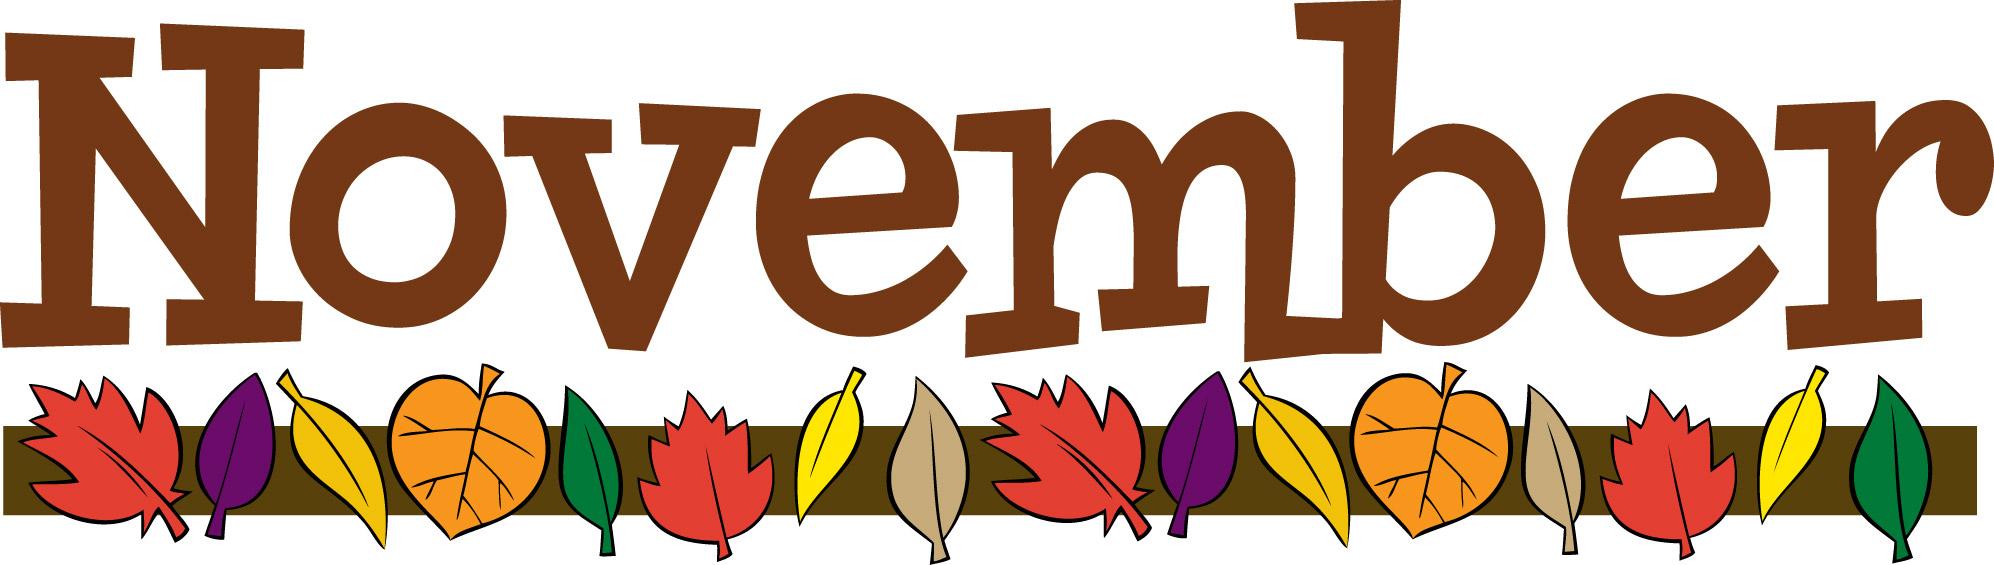 Month November Clipart Free for November Calendar Clipart Free